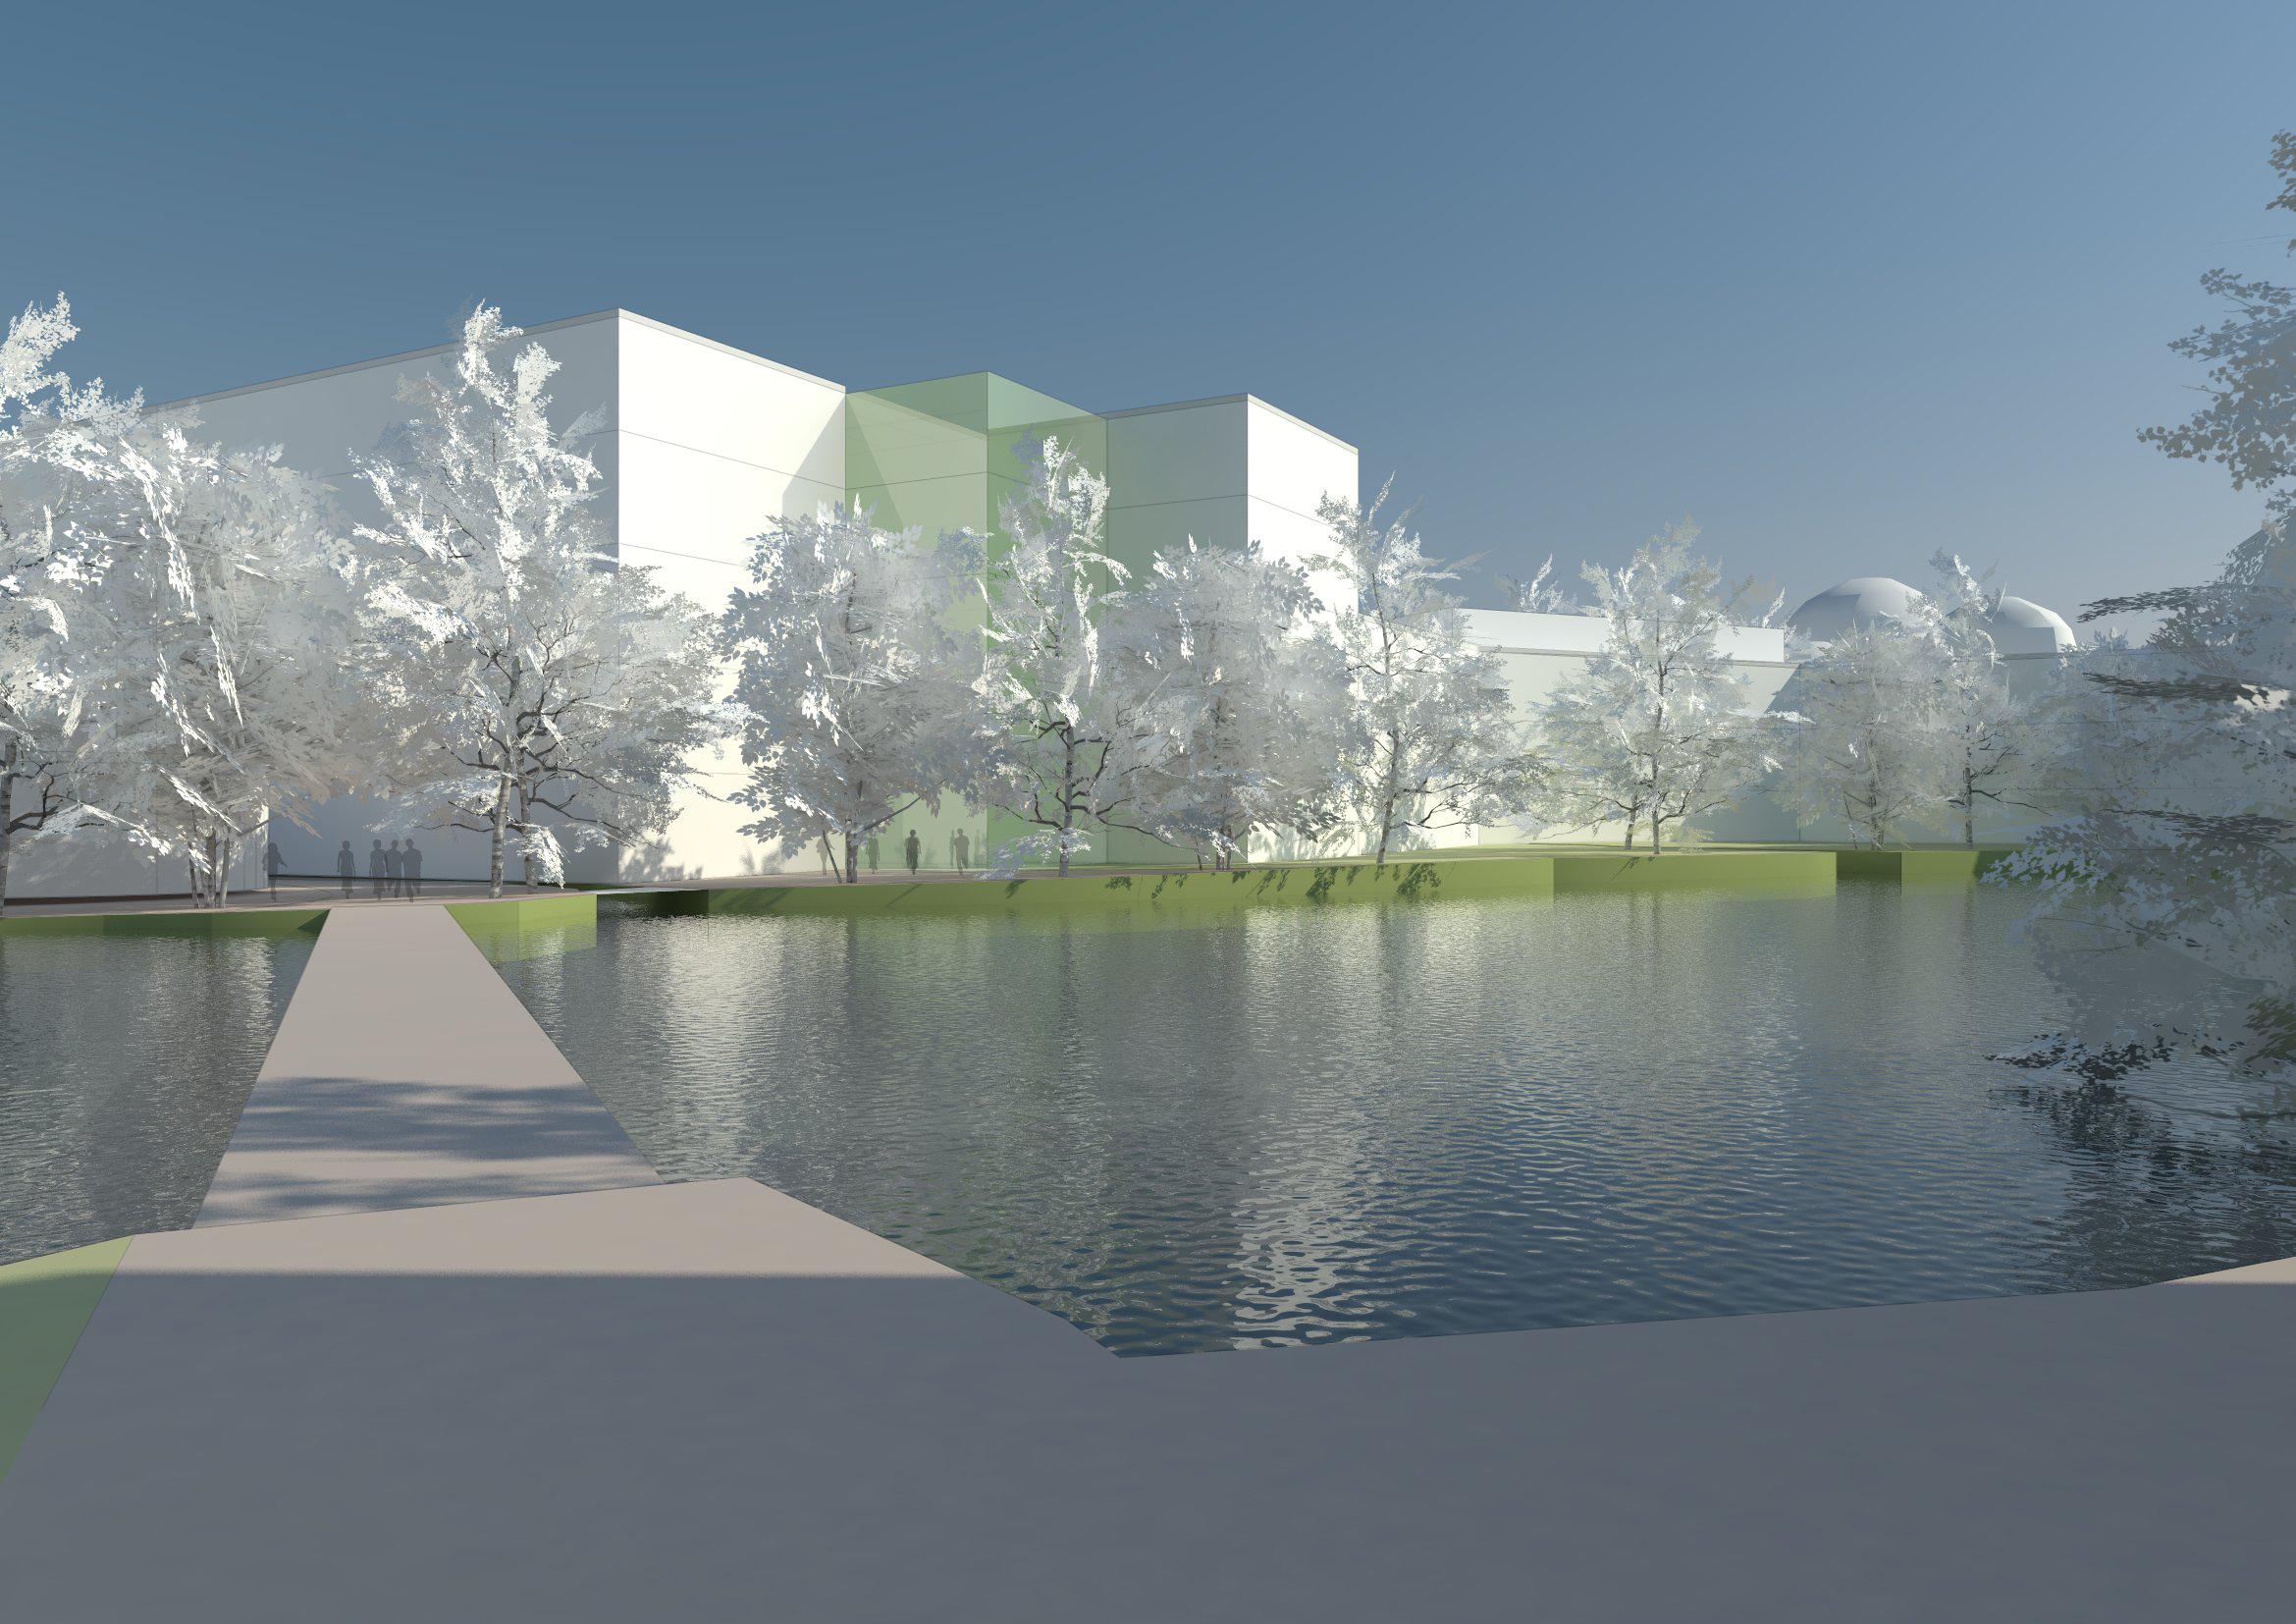 Stephen-Hill-Architects-York-University-Peninsula-Study-06